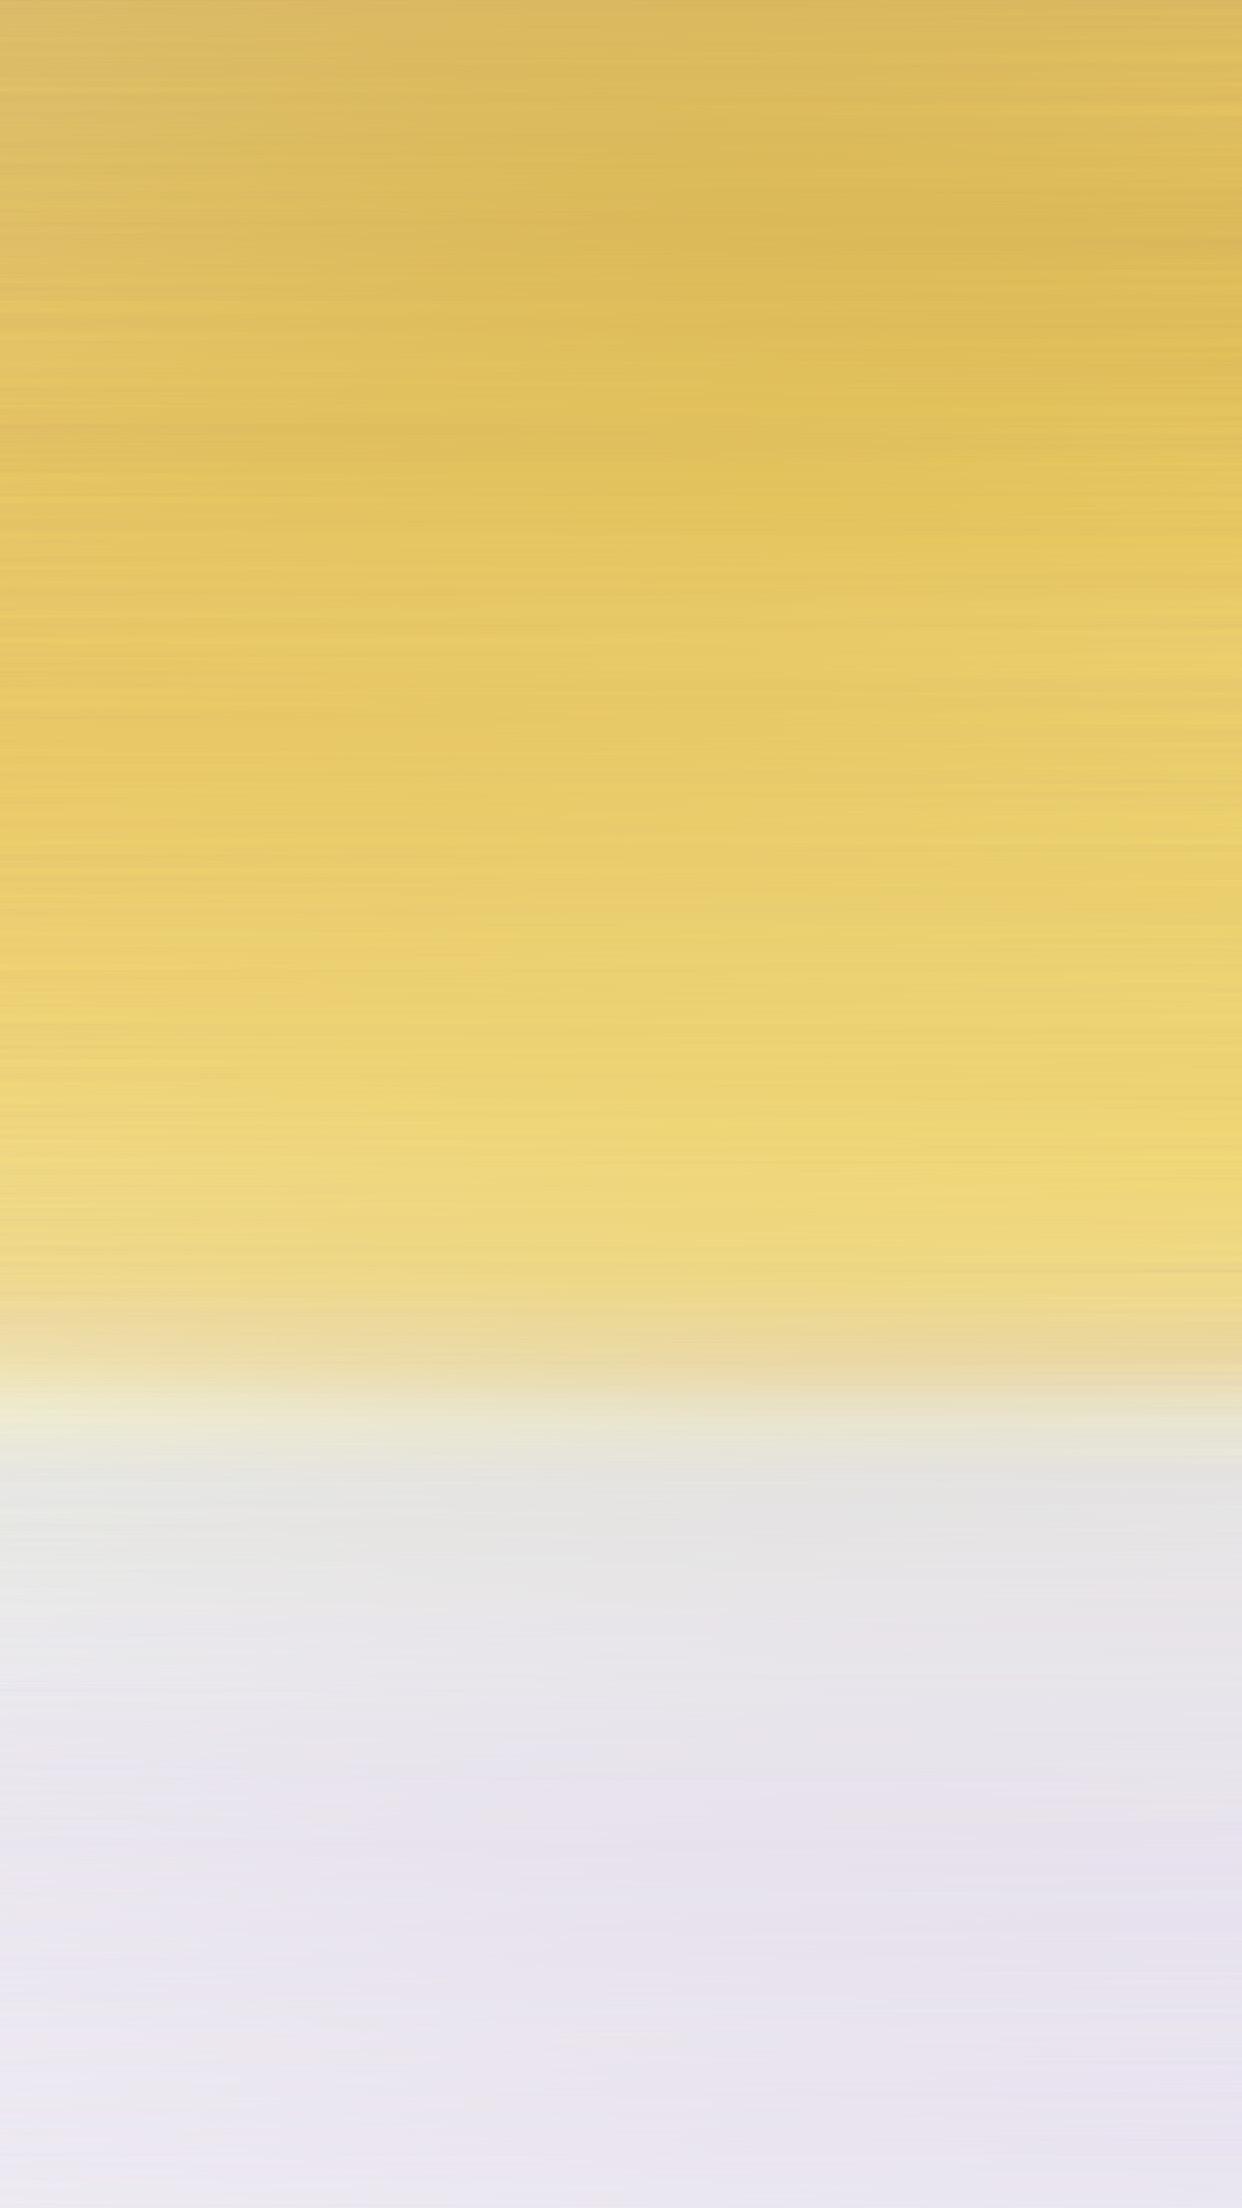 sg30-motion-gold-beer-white-gradation-blur